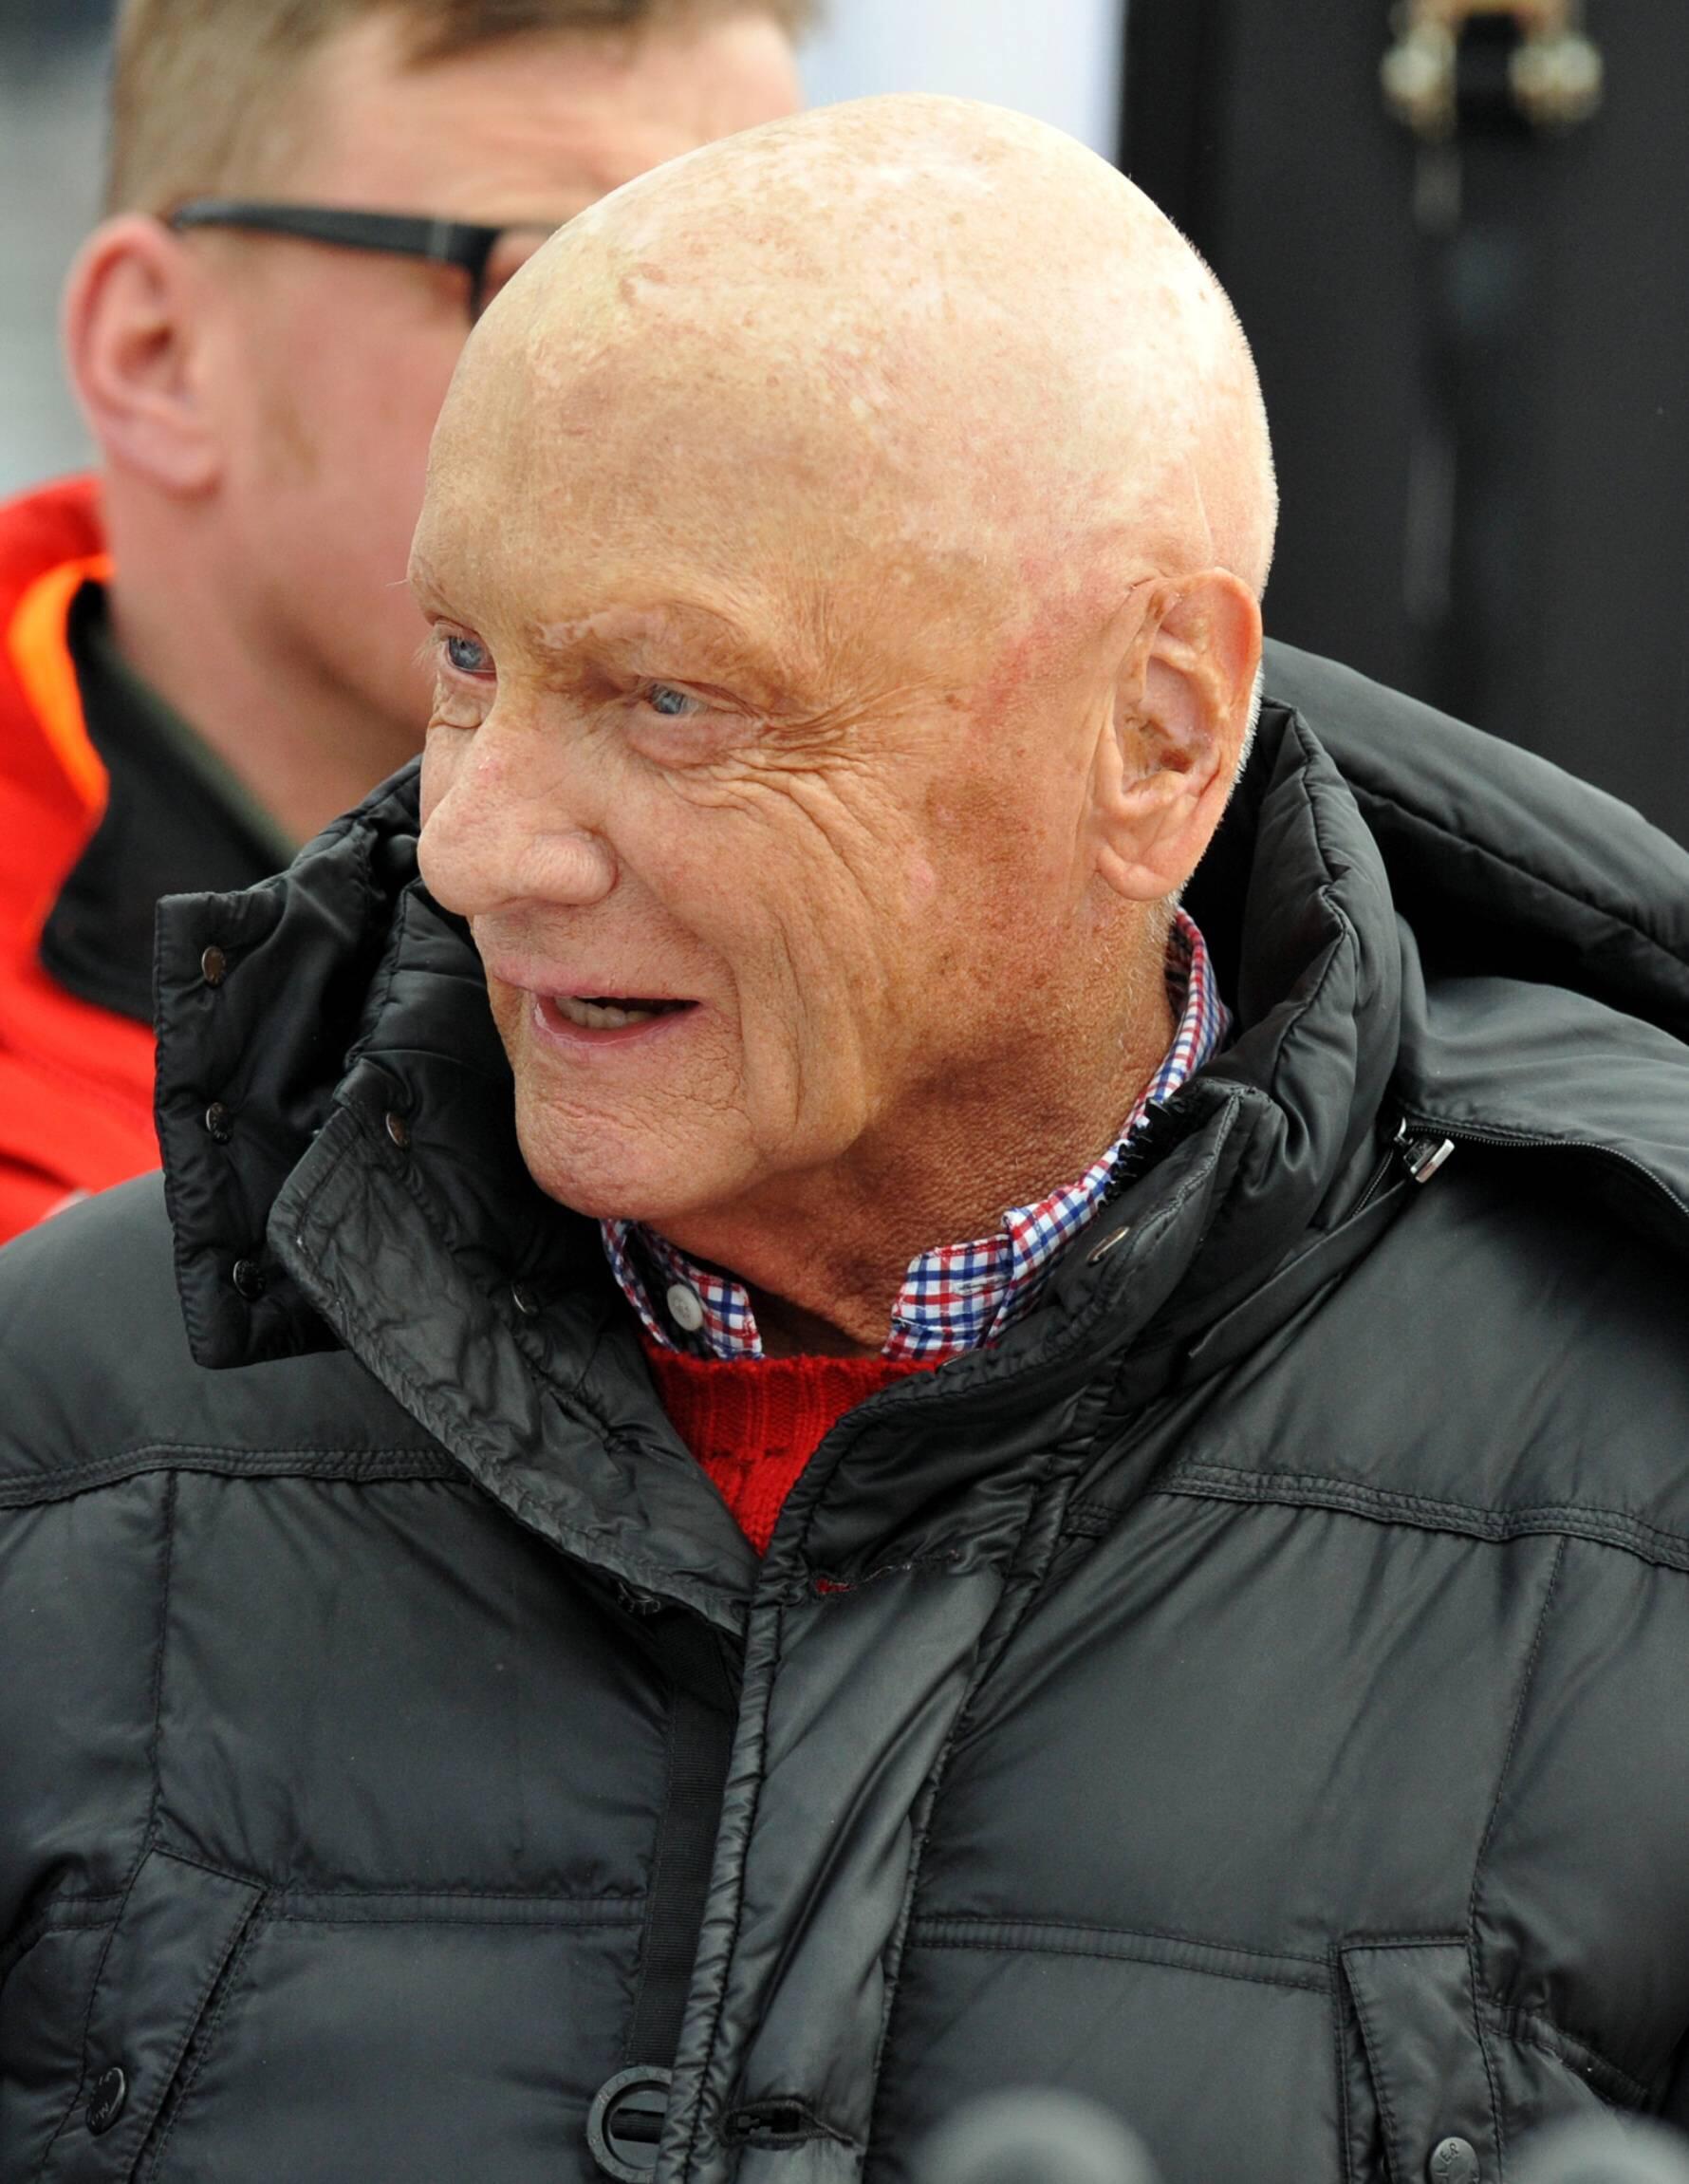 Bild zu Niki Lauda, 2014, Kitzbühel, Glatze, Hahnenkamm, Hahnenkammrennen